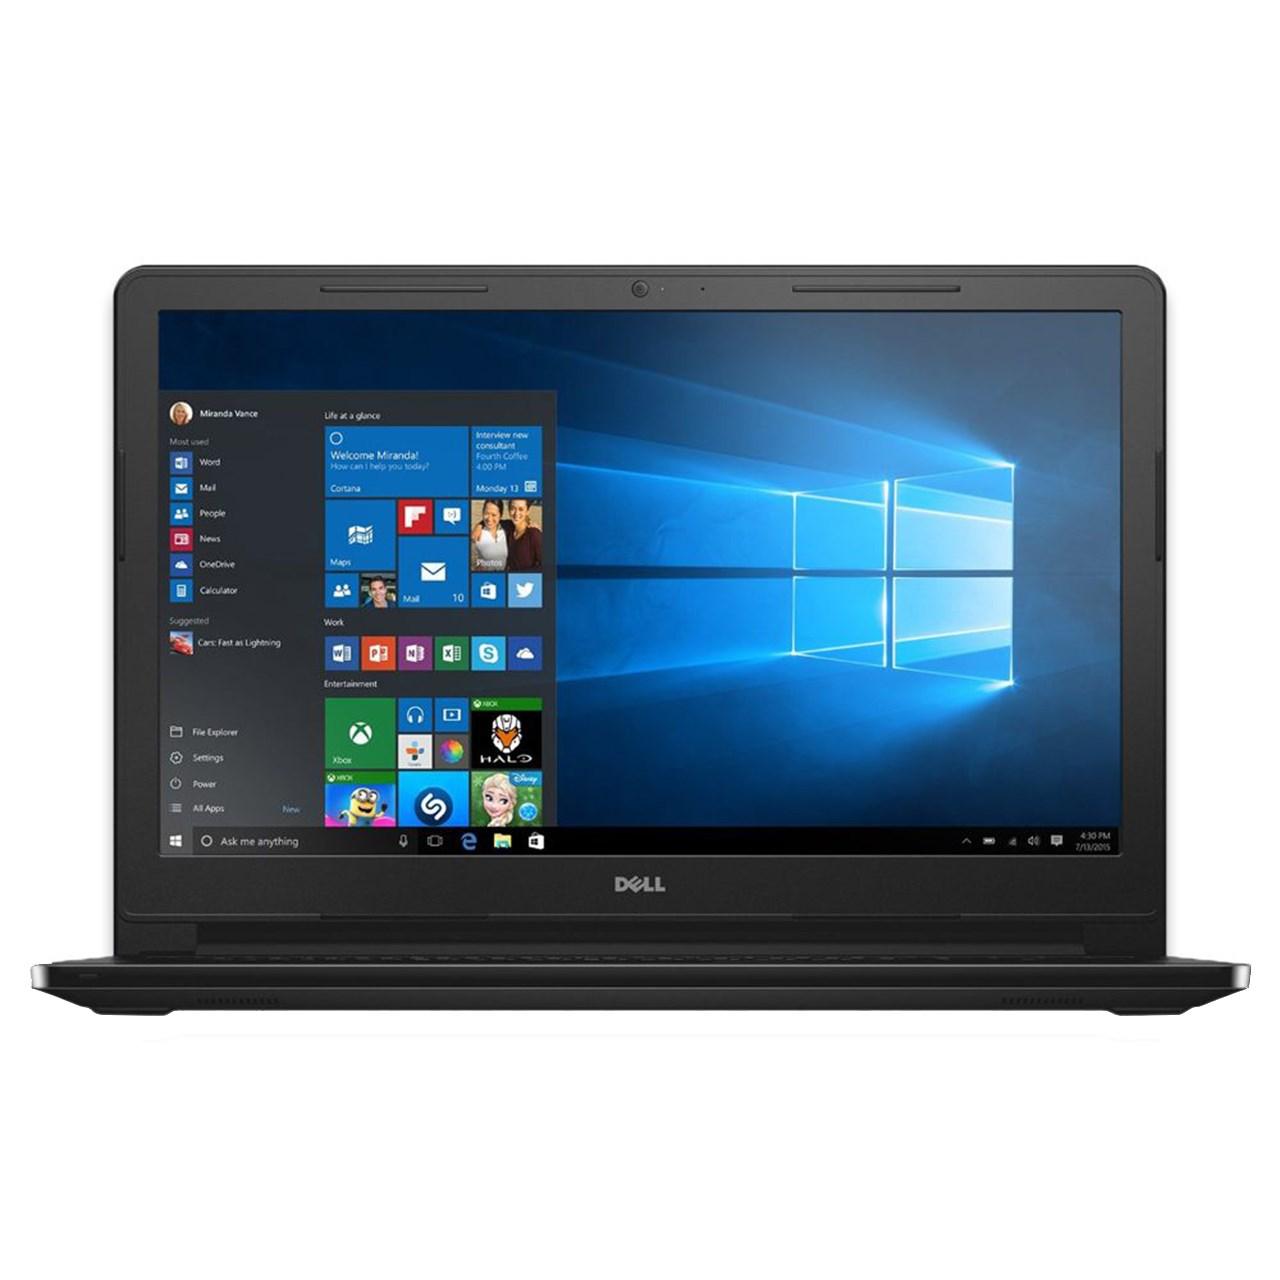 لپ تاپ 15.6 اینچی دل مدل INSPIRON 3552 -AC B   INSPIRON 3552 - AC B - 15.6 inch Laptop